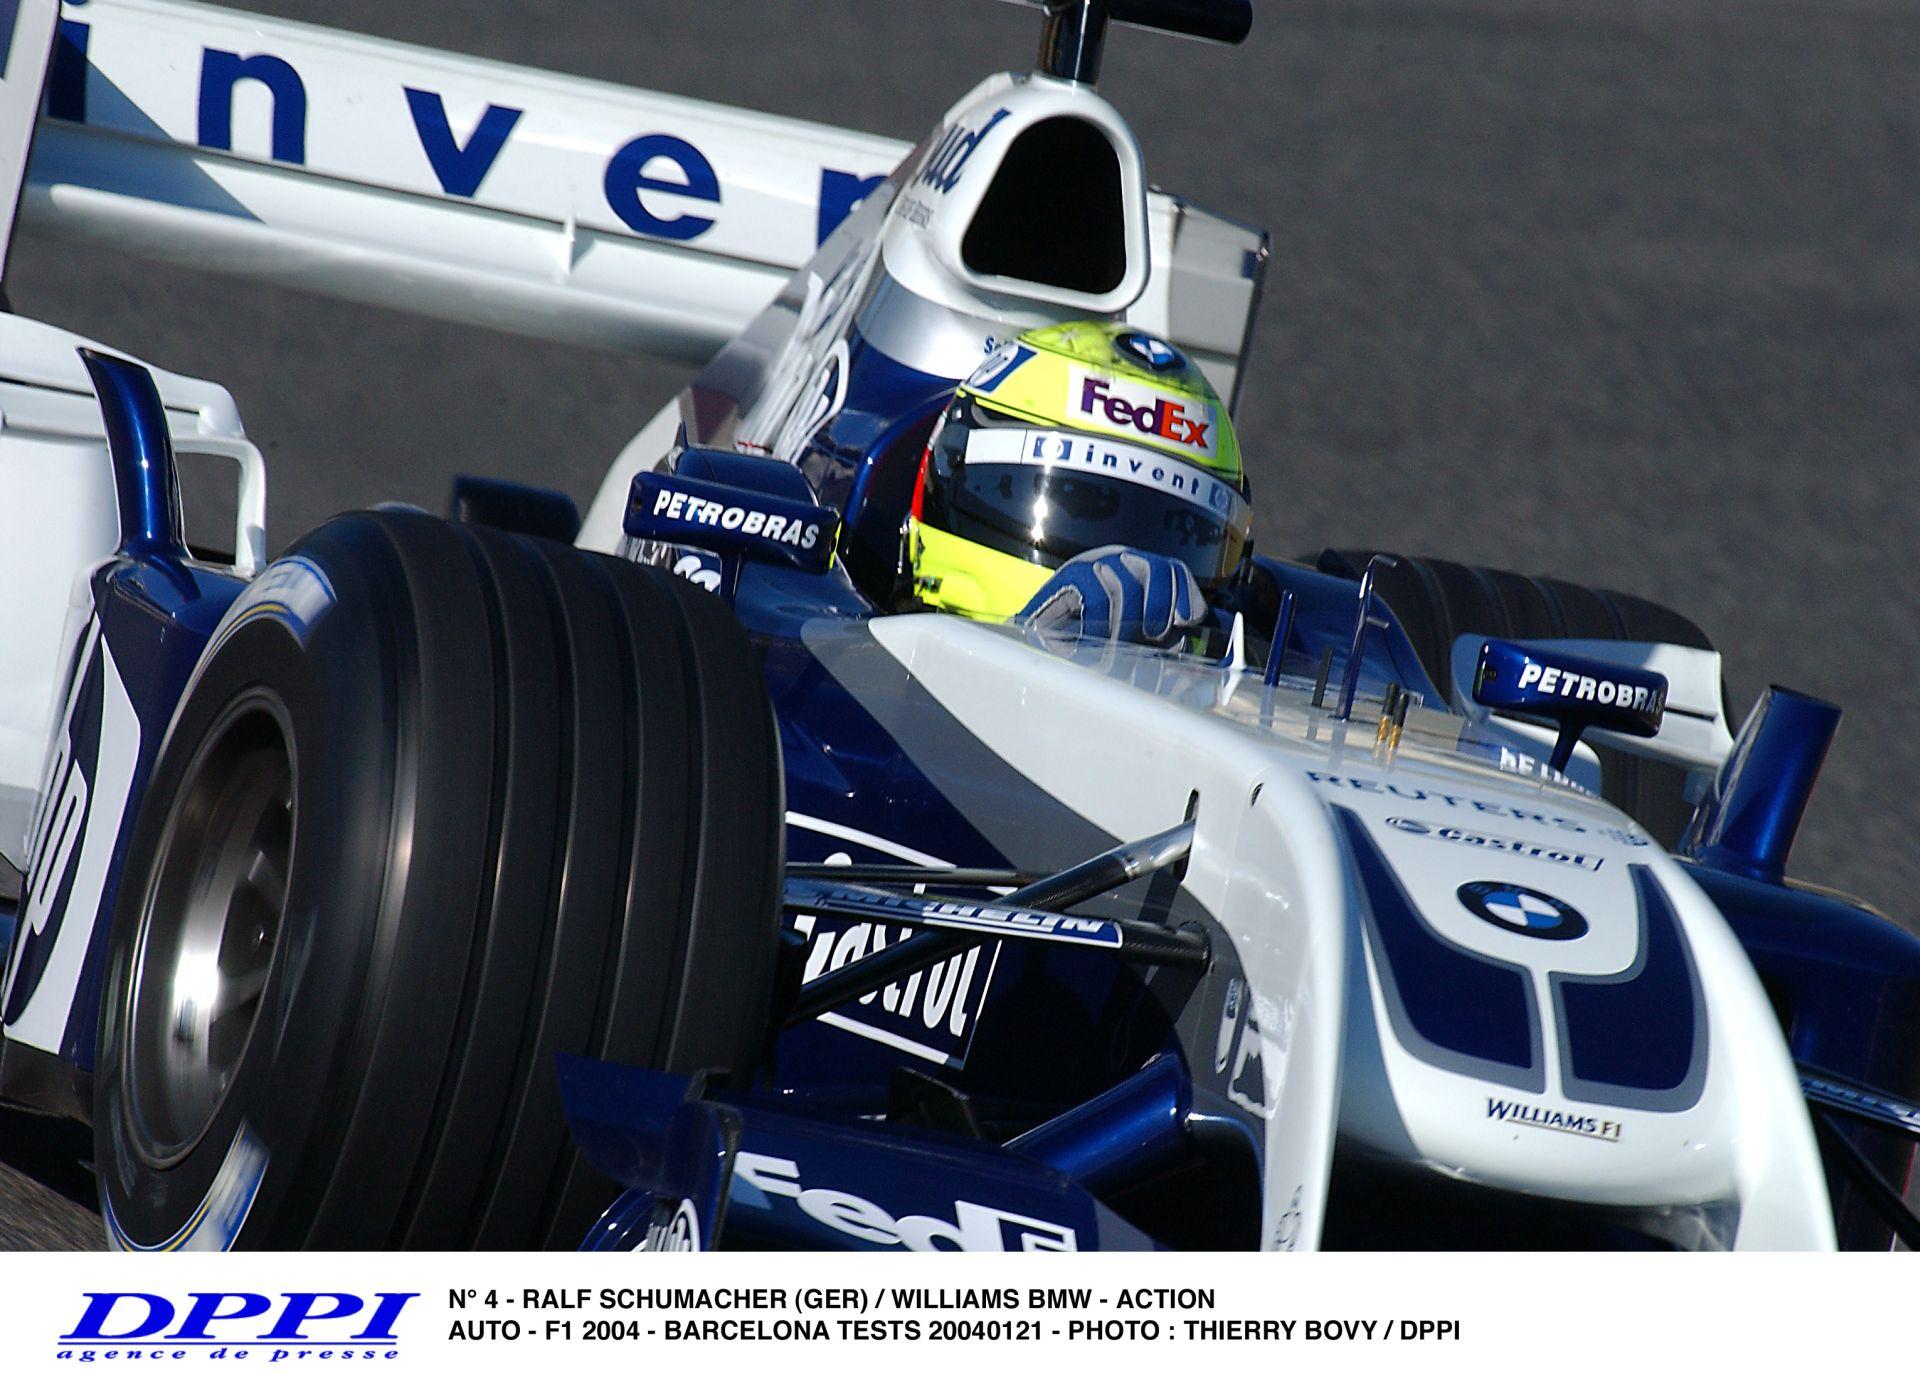 Ralf Schumacher ezen a napon vonult vissza a Forma-1-ből